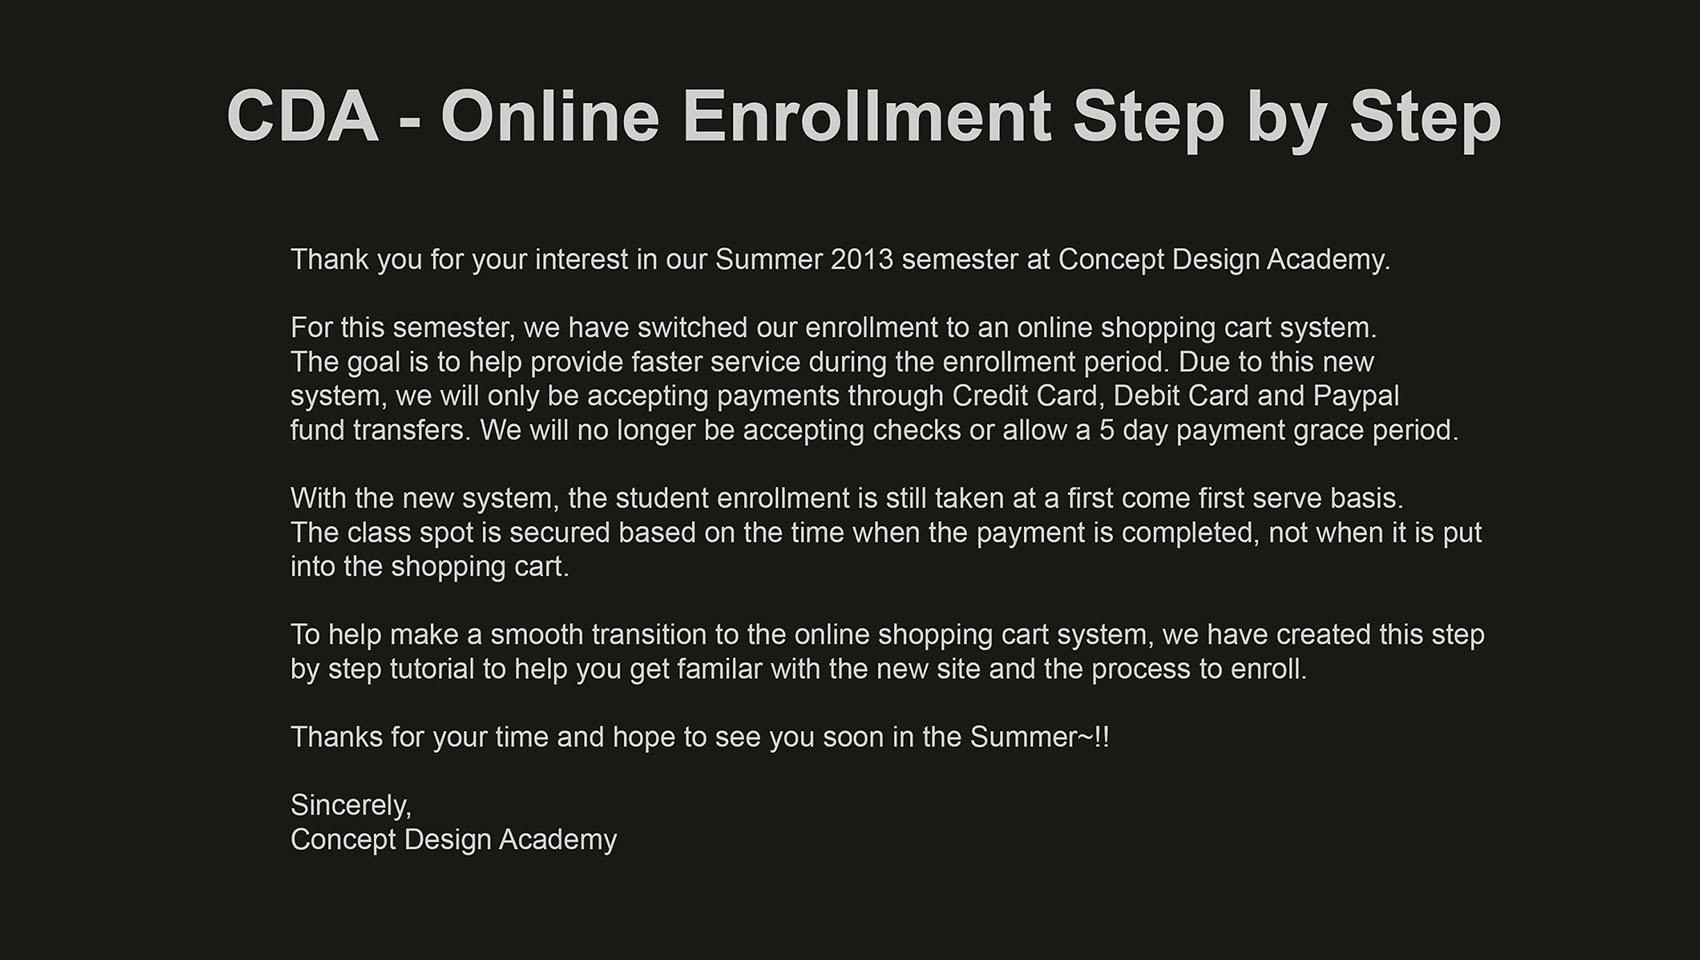 CDA Enrollment Instructions 00.jpg